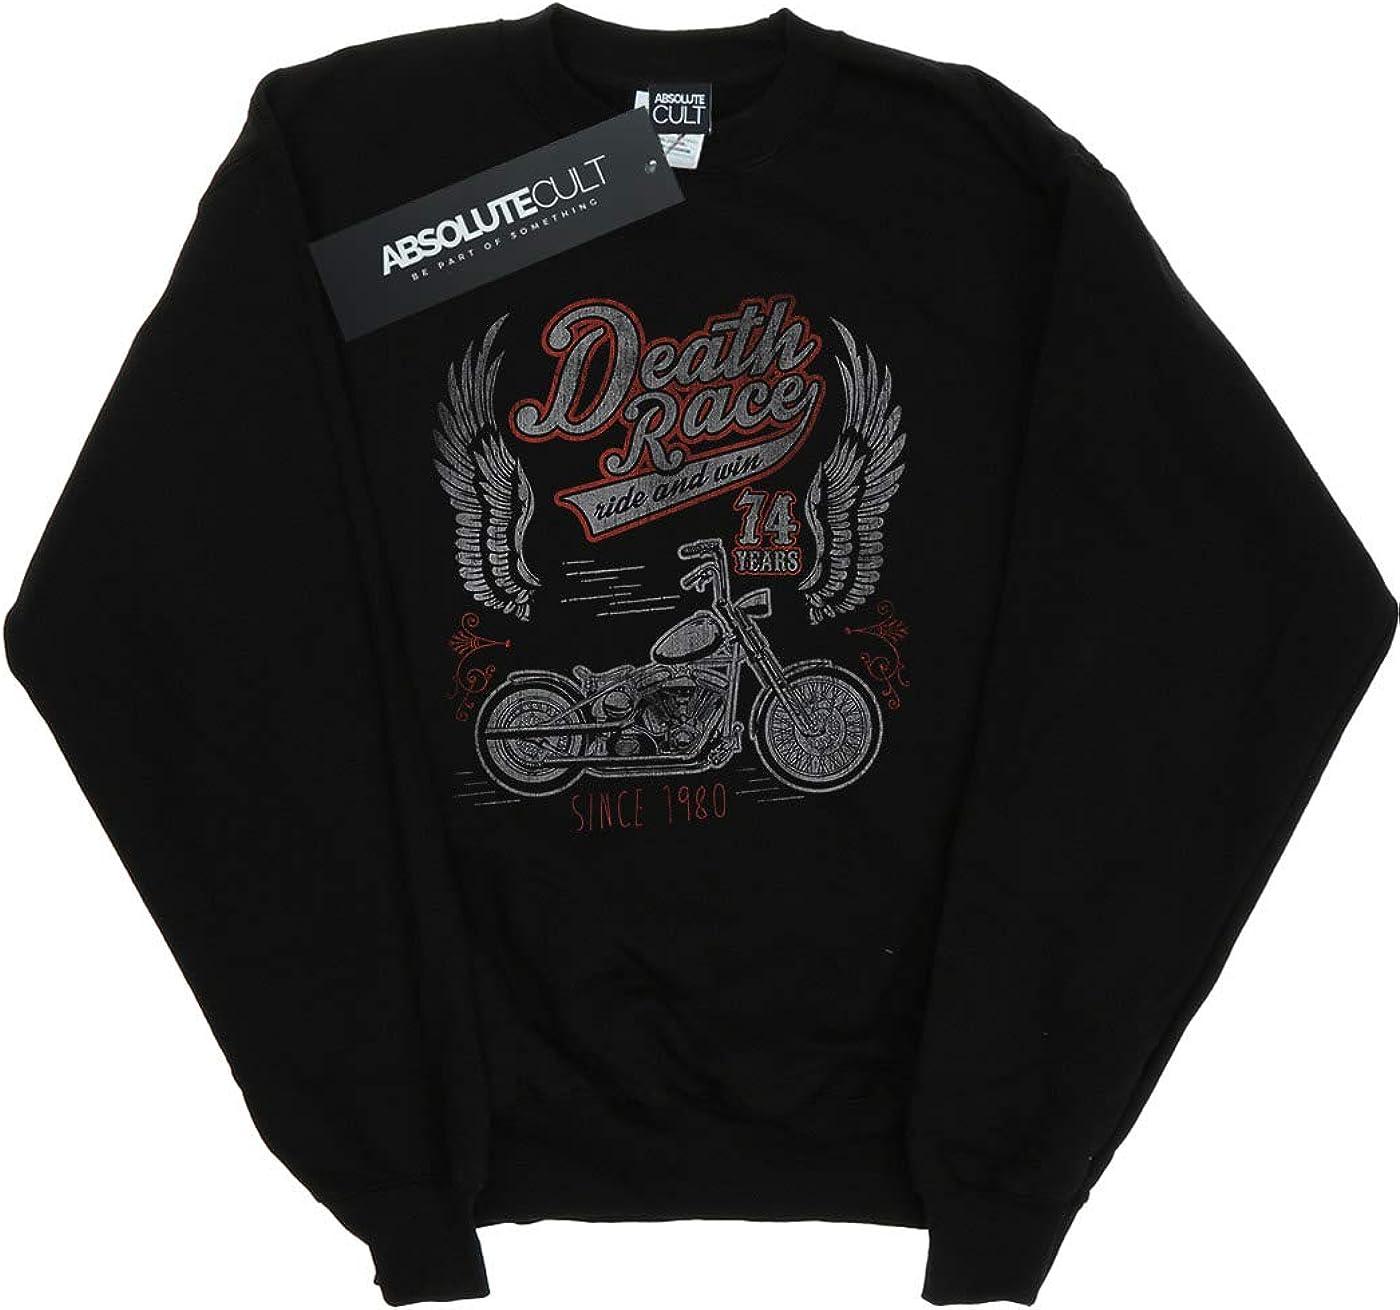 Absolute Cult Drewbacca Girls Death Race 1980 Sweatshirt